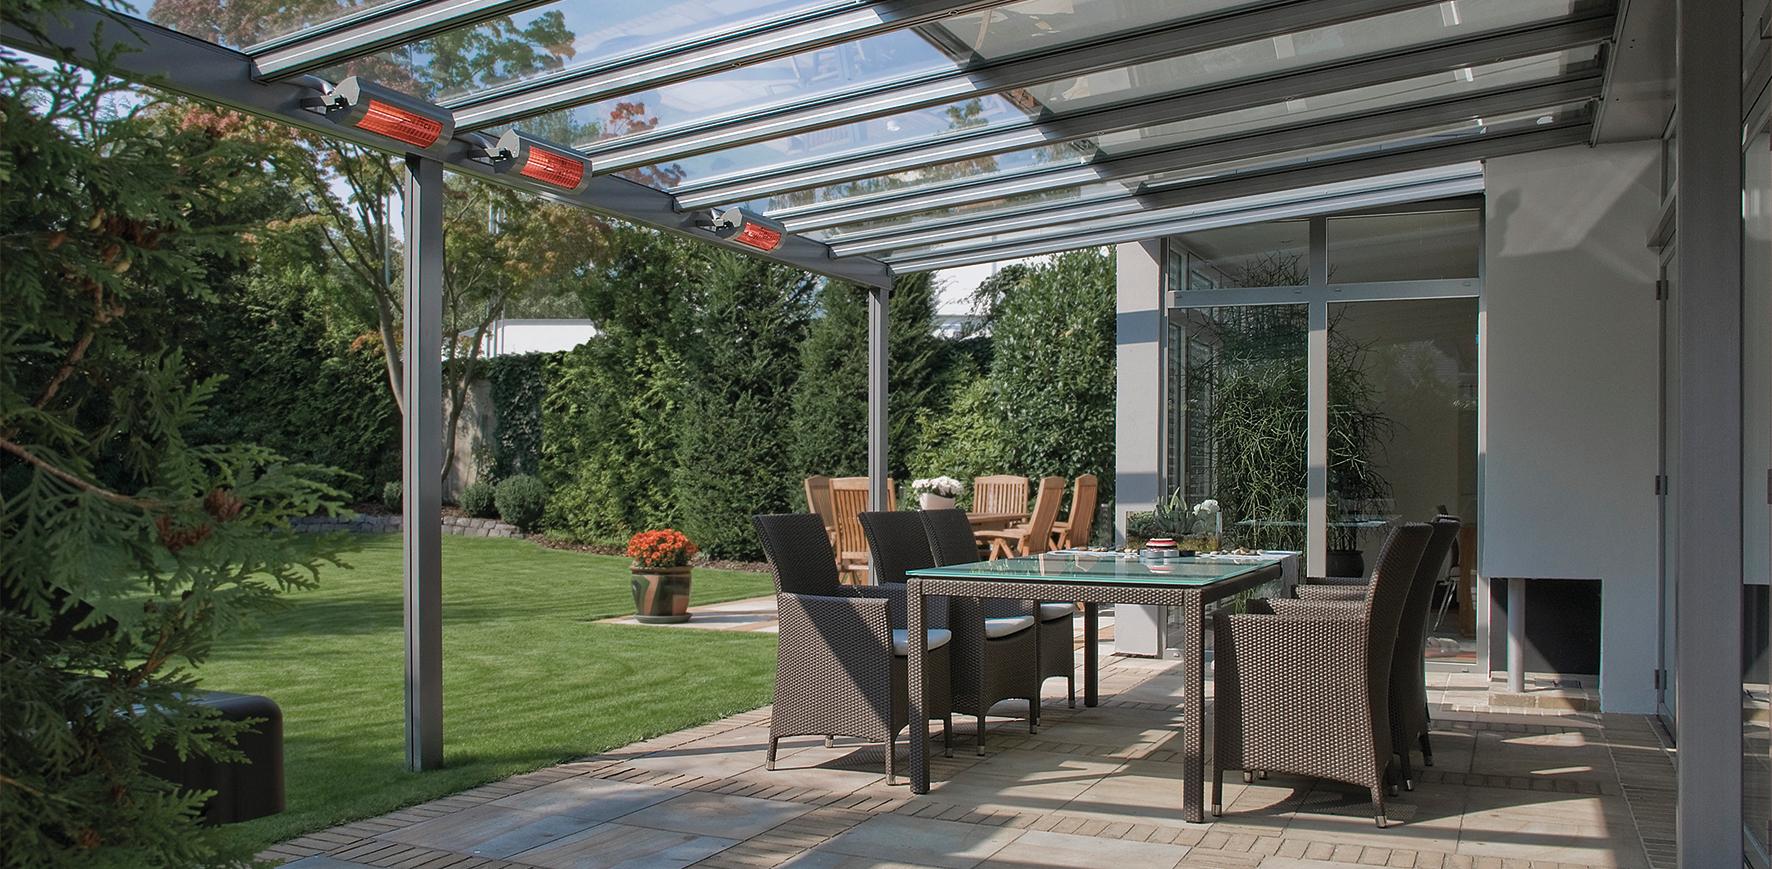 lohr baubedarf gmbh fenster t ren tore haust ren sonnenschutz dachfenster ebersberg. Black Bedroom Furniture Sets. Home Design Ideas